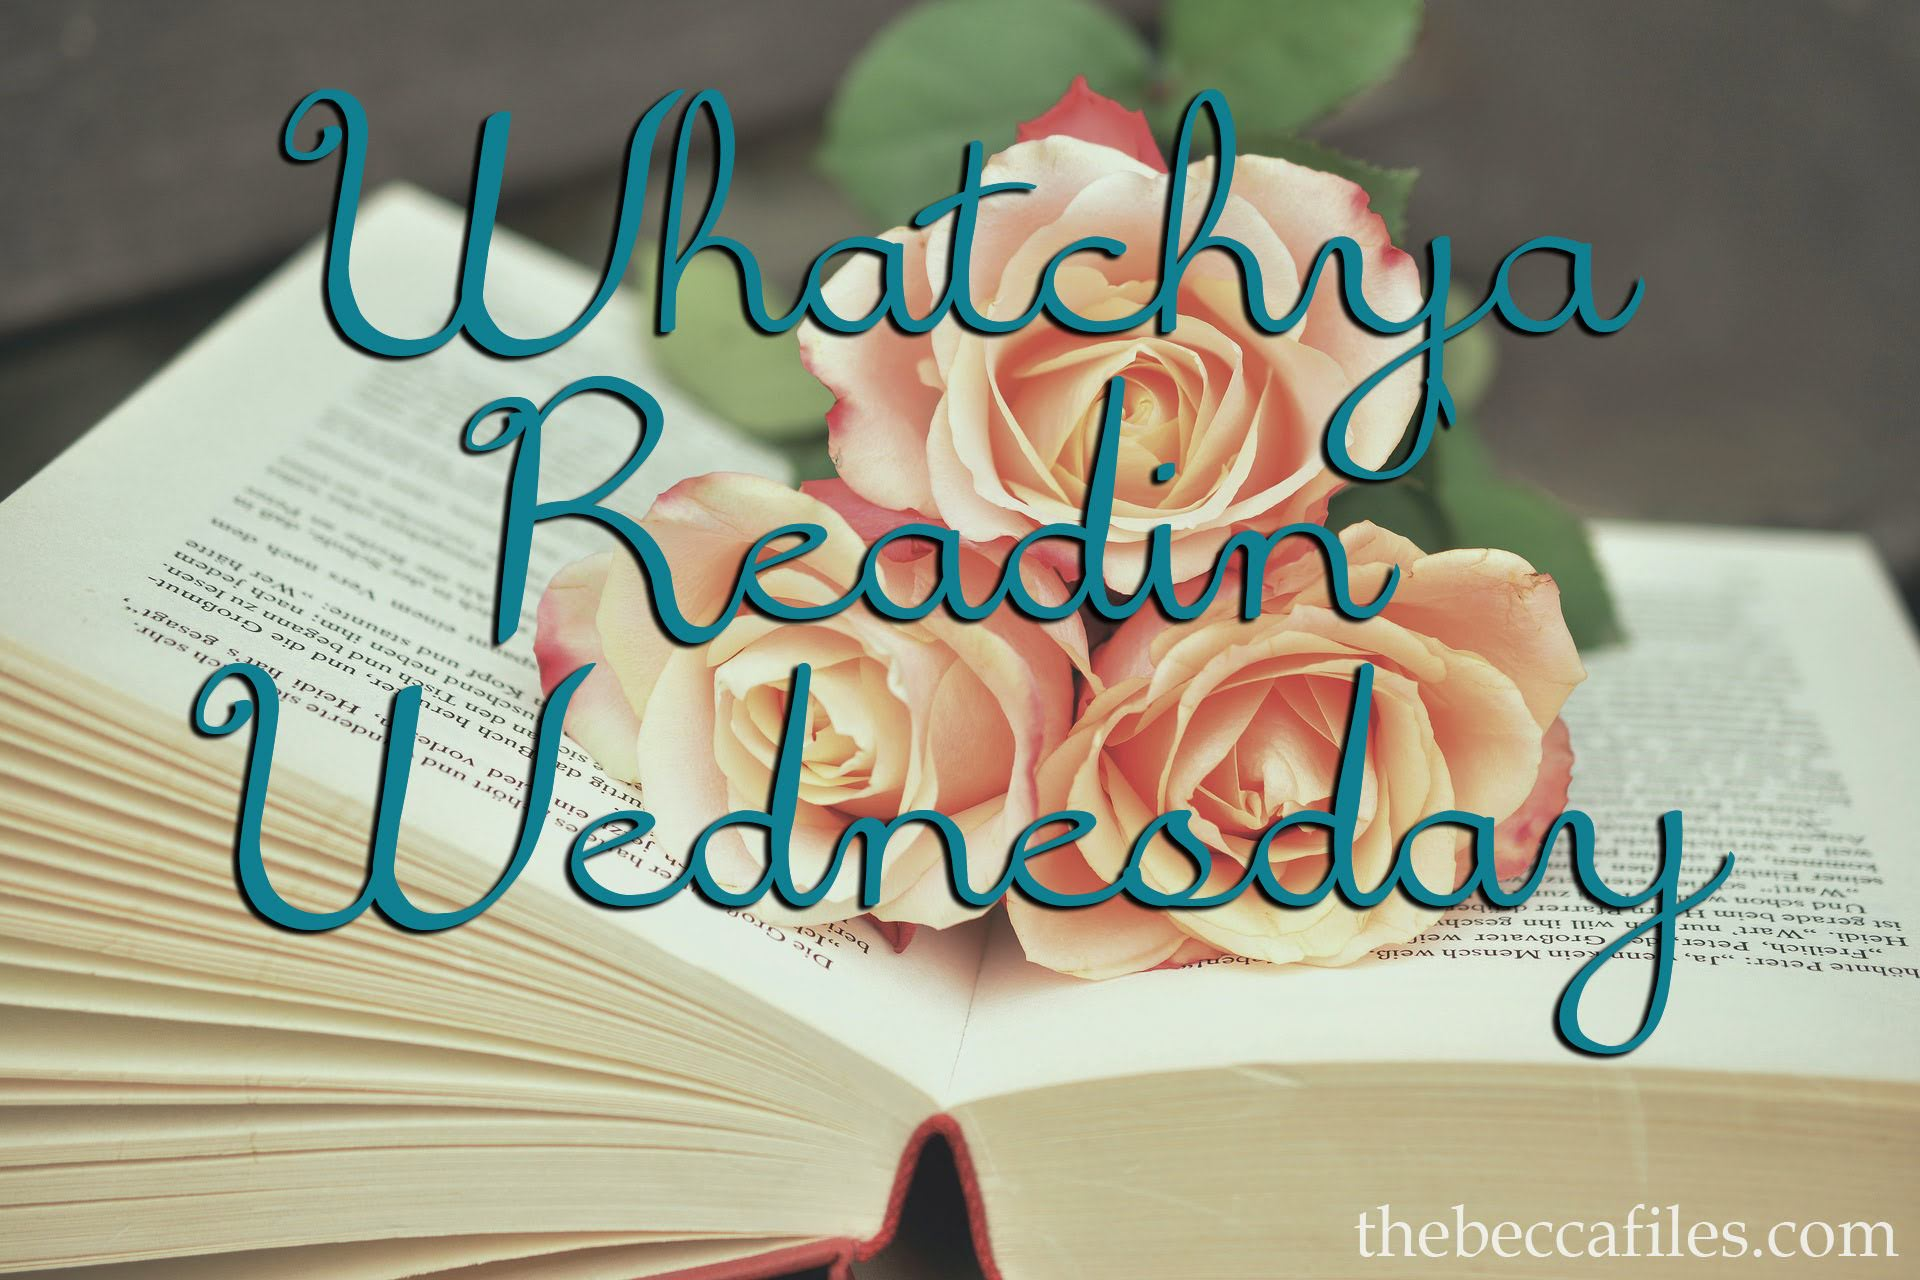 whatchya-readin-weds-2